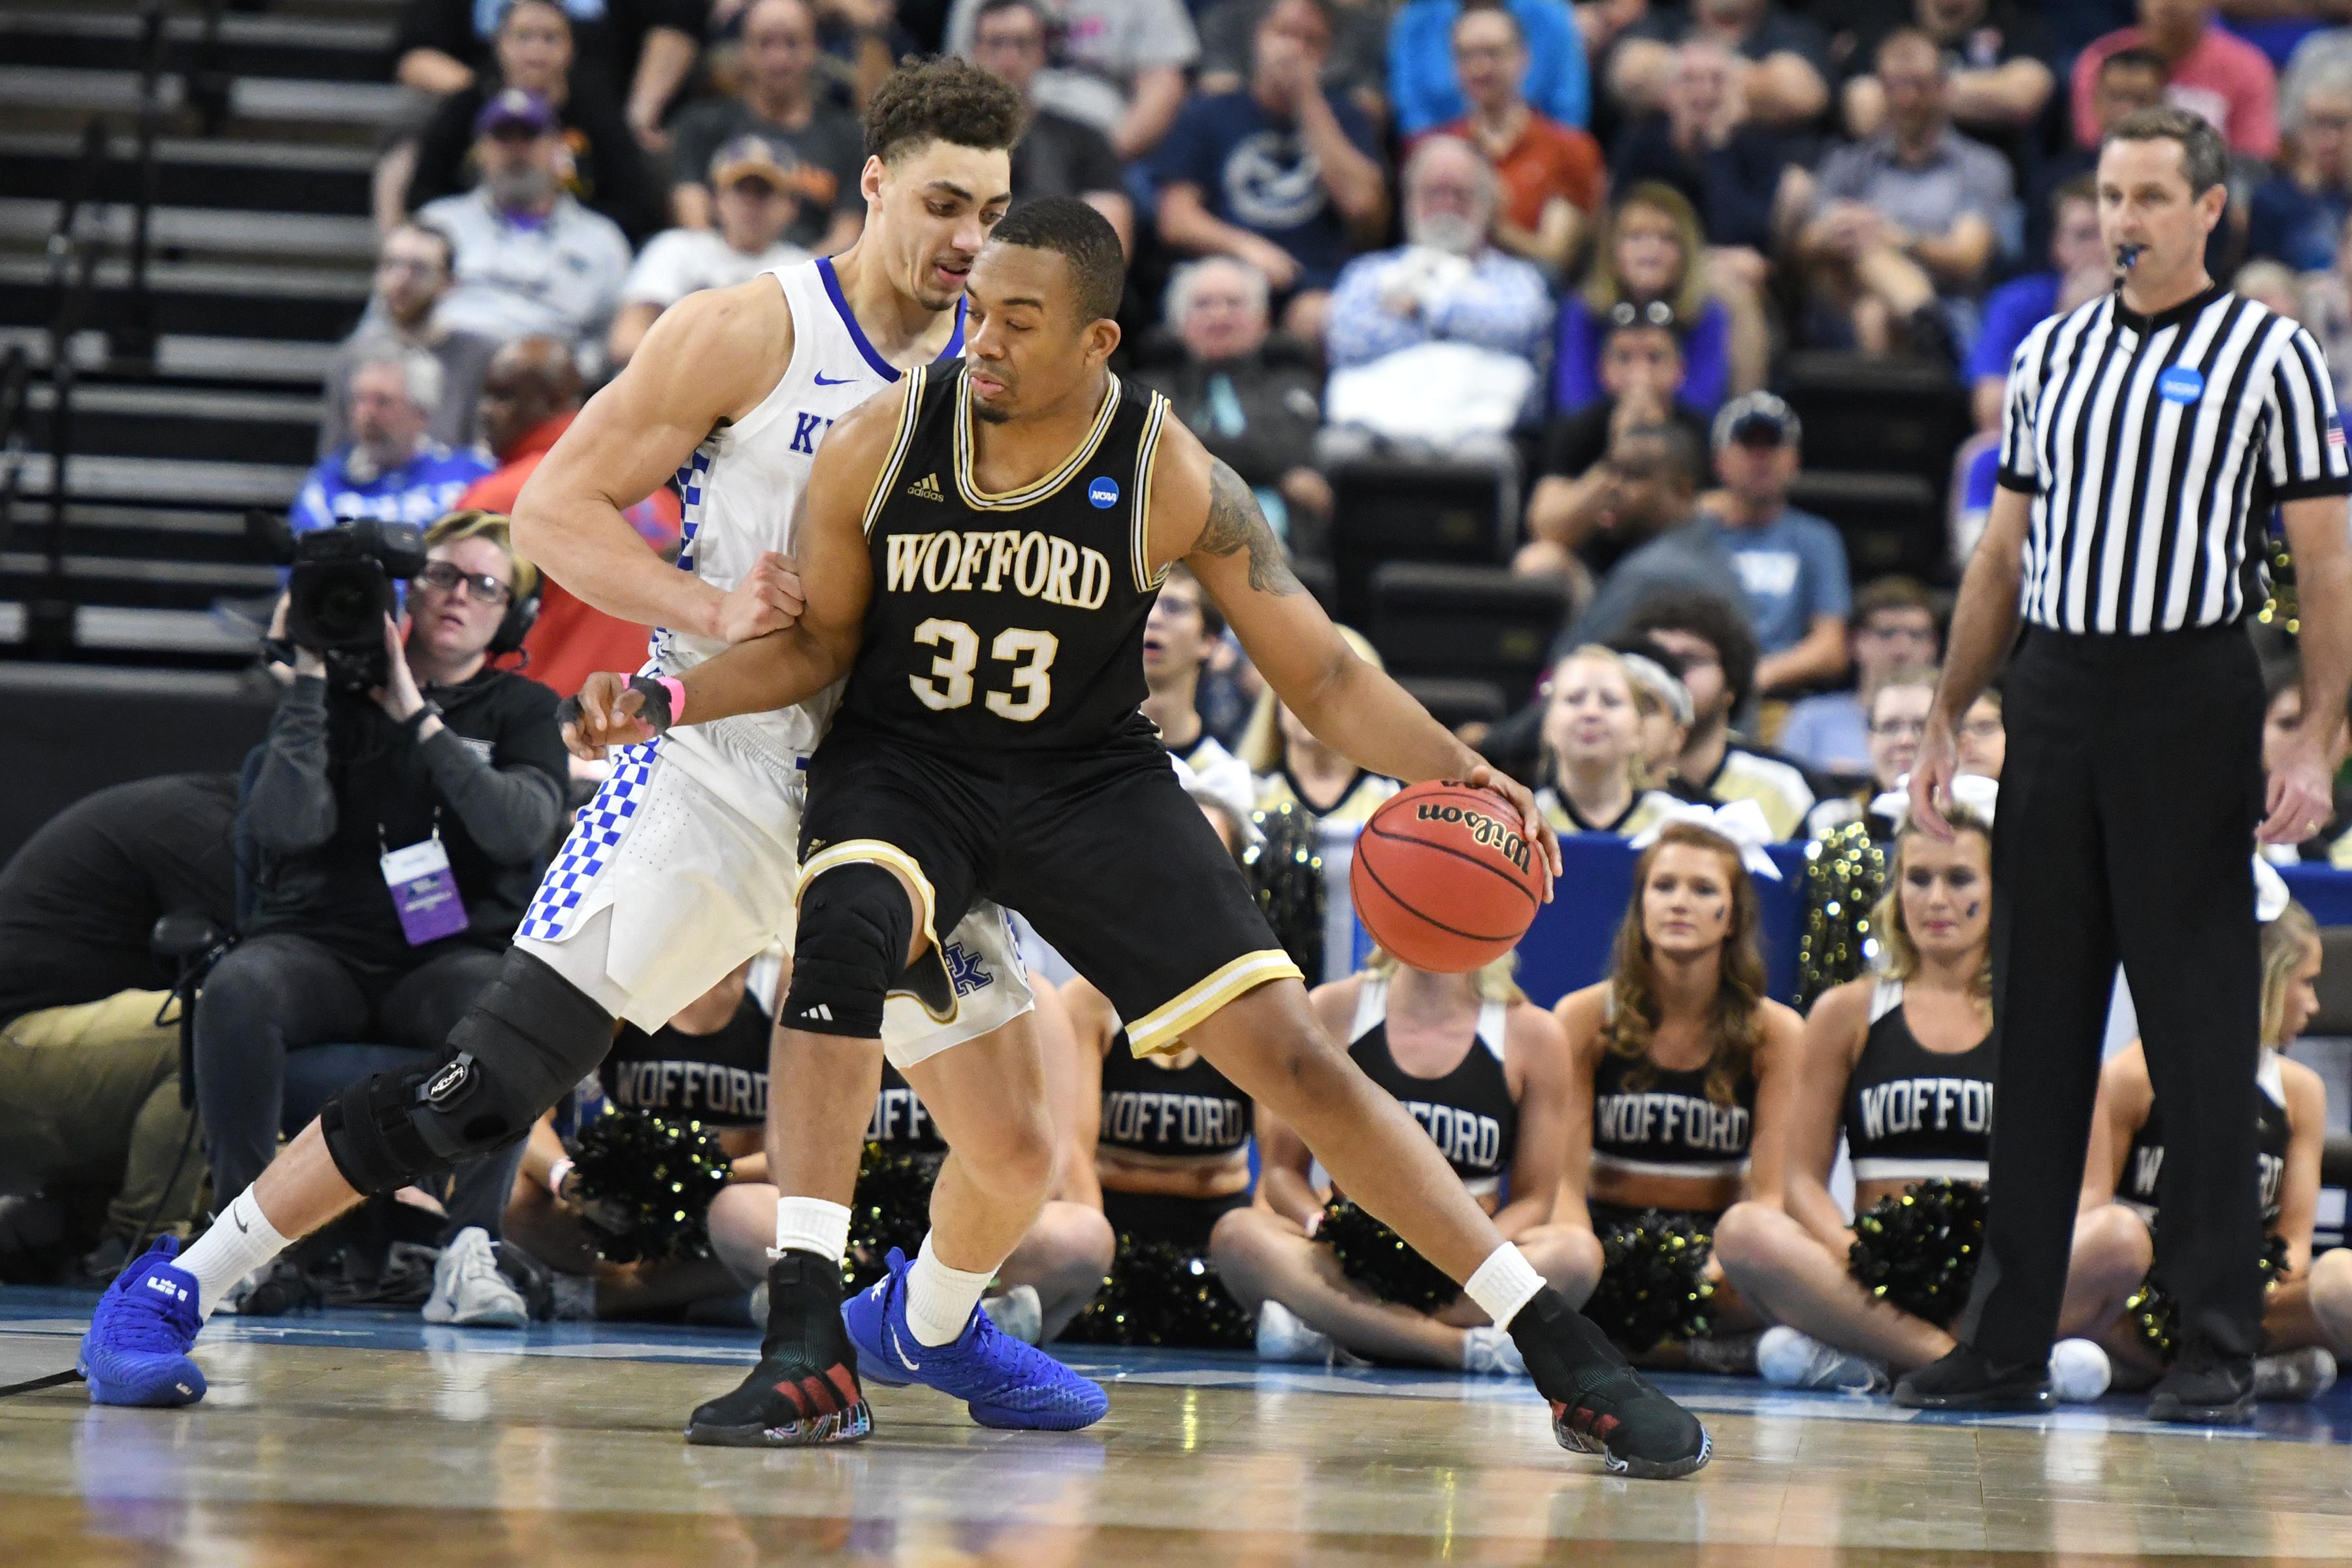 NCAA Men's Basketball Tournament - Second Round